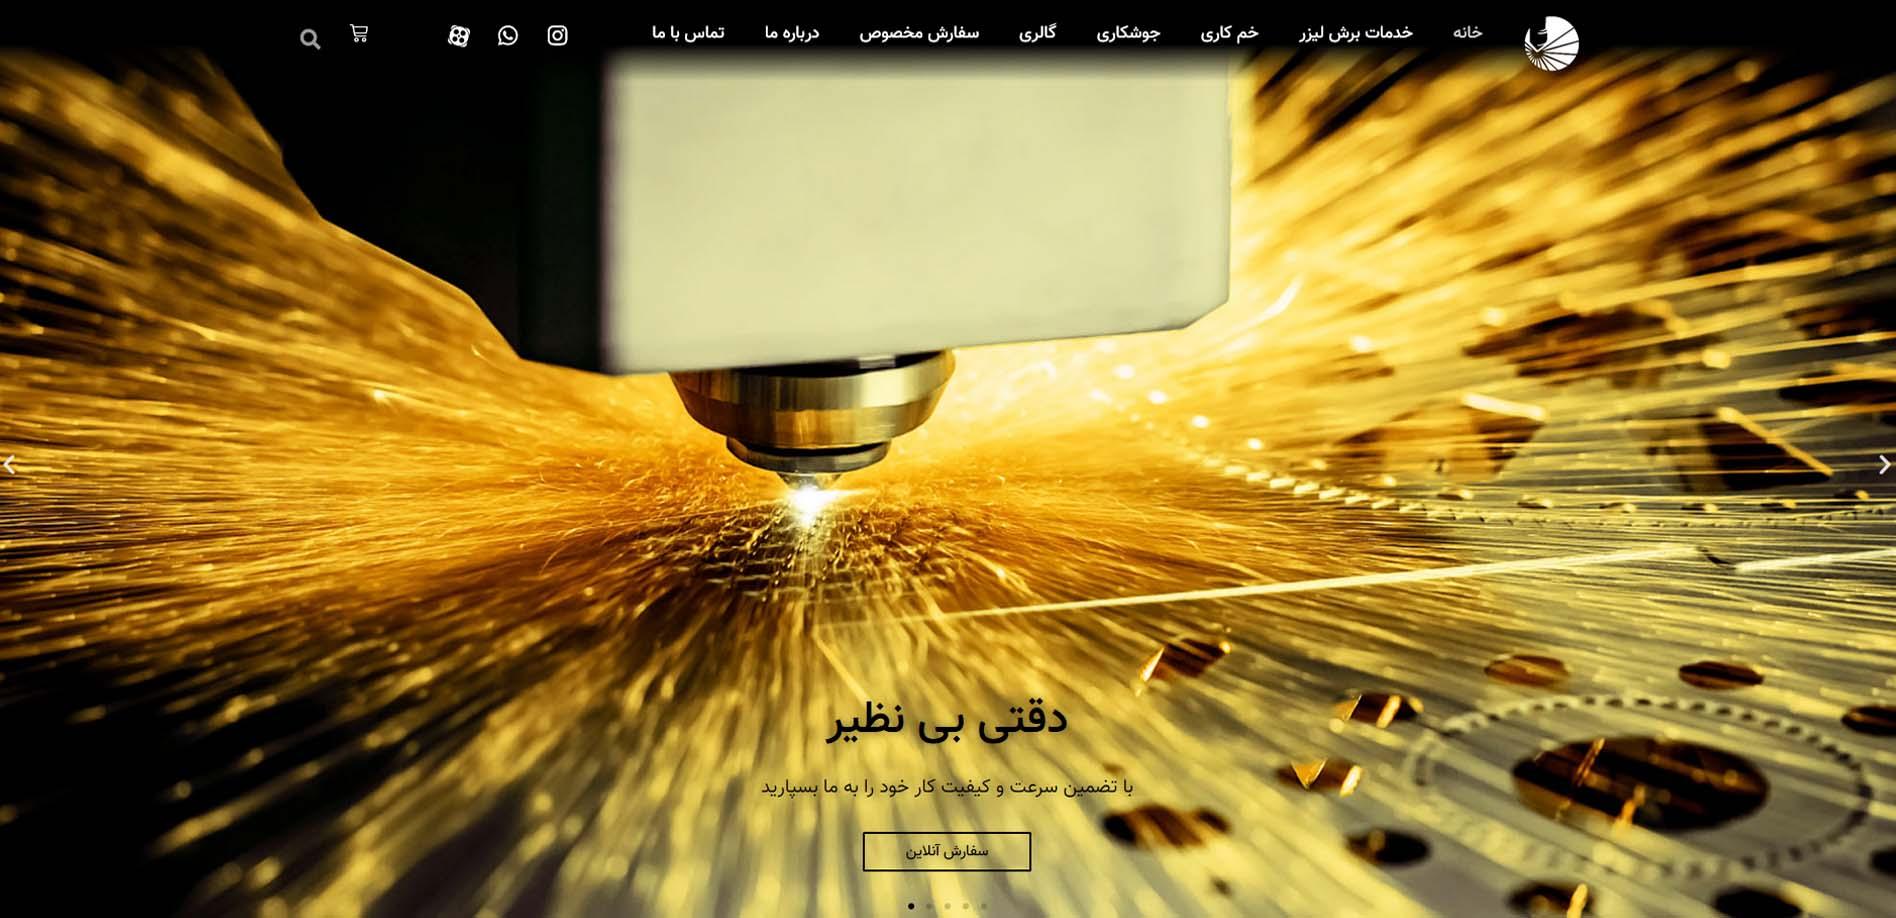 metalboresh - طراحی سایت